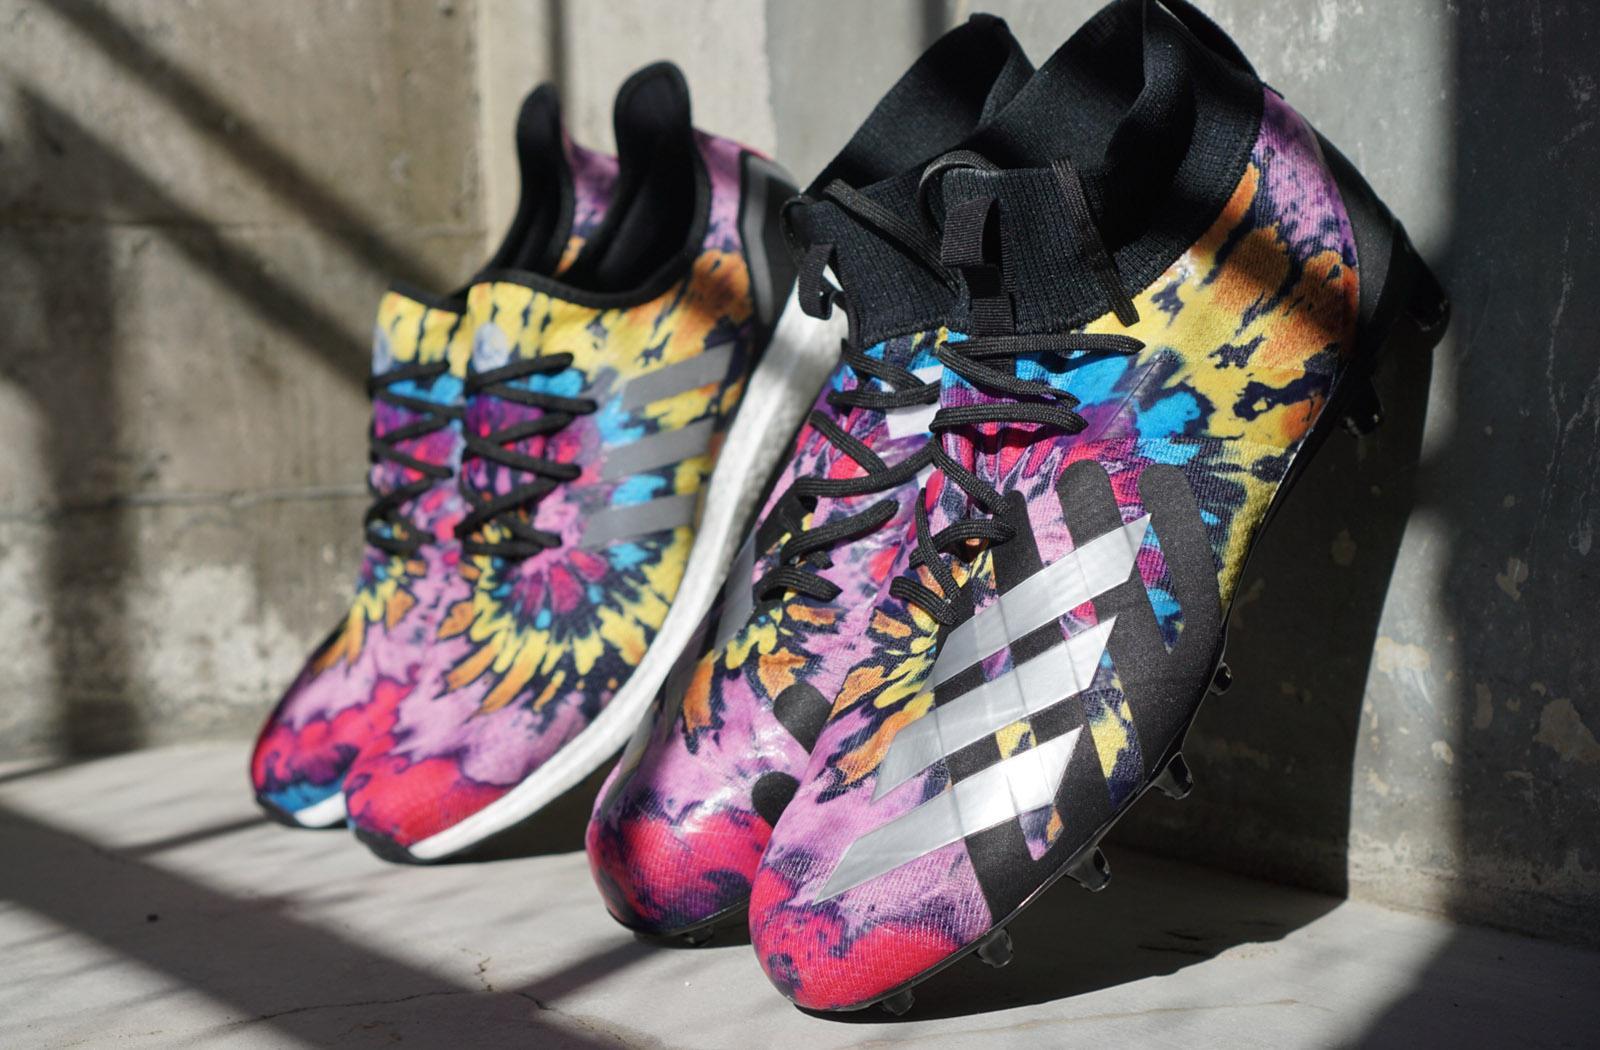 2019 adidas x FootLocker SPEEDFACTORY AM4ATL Cleats   Shoes.jpg 37333ff76